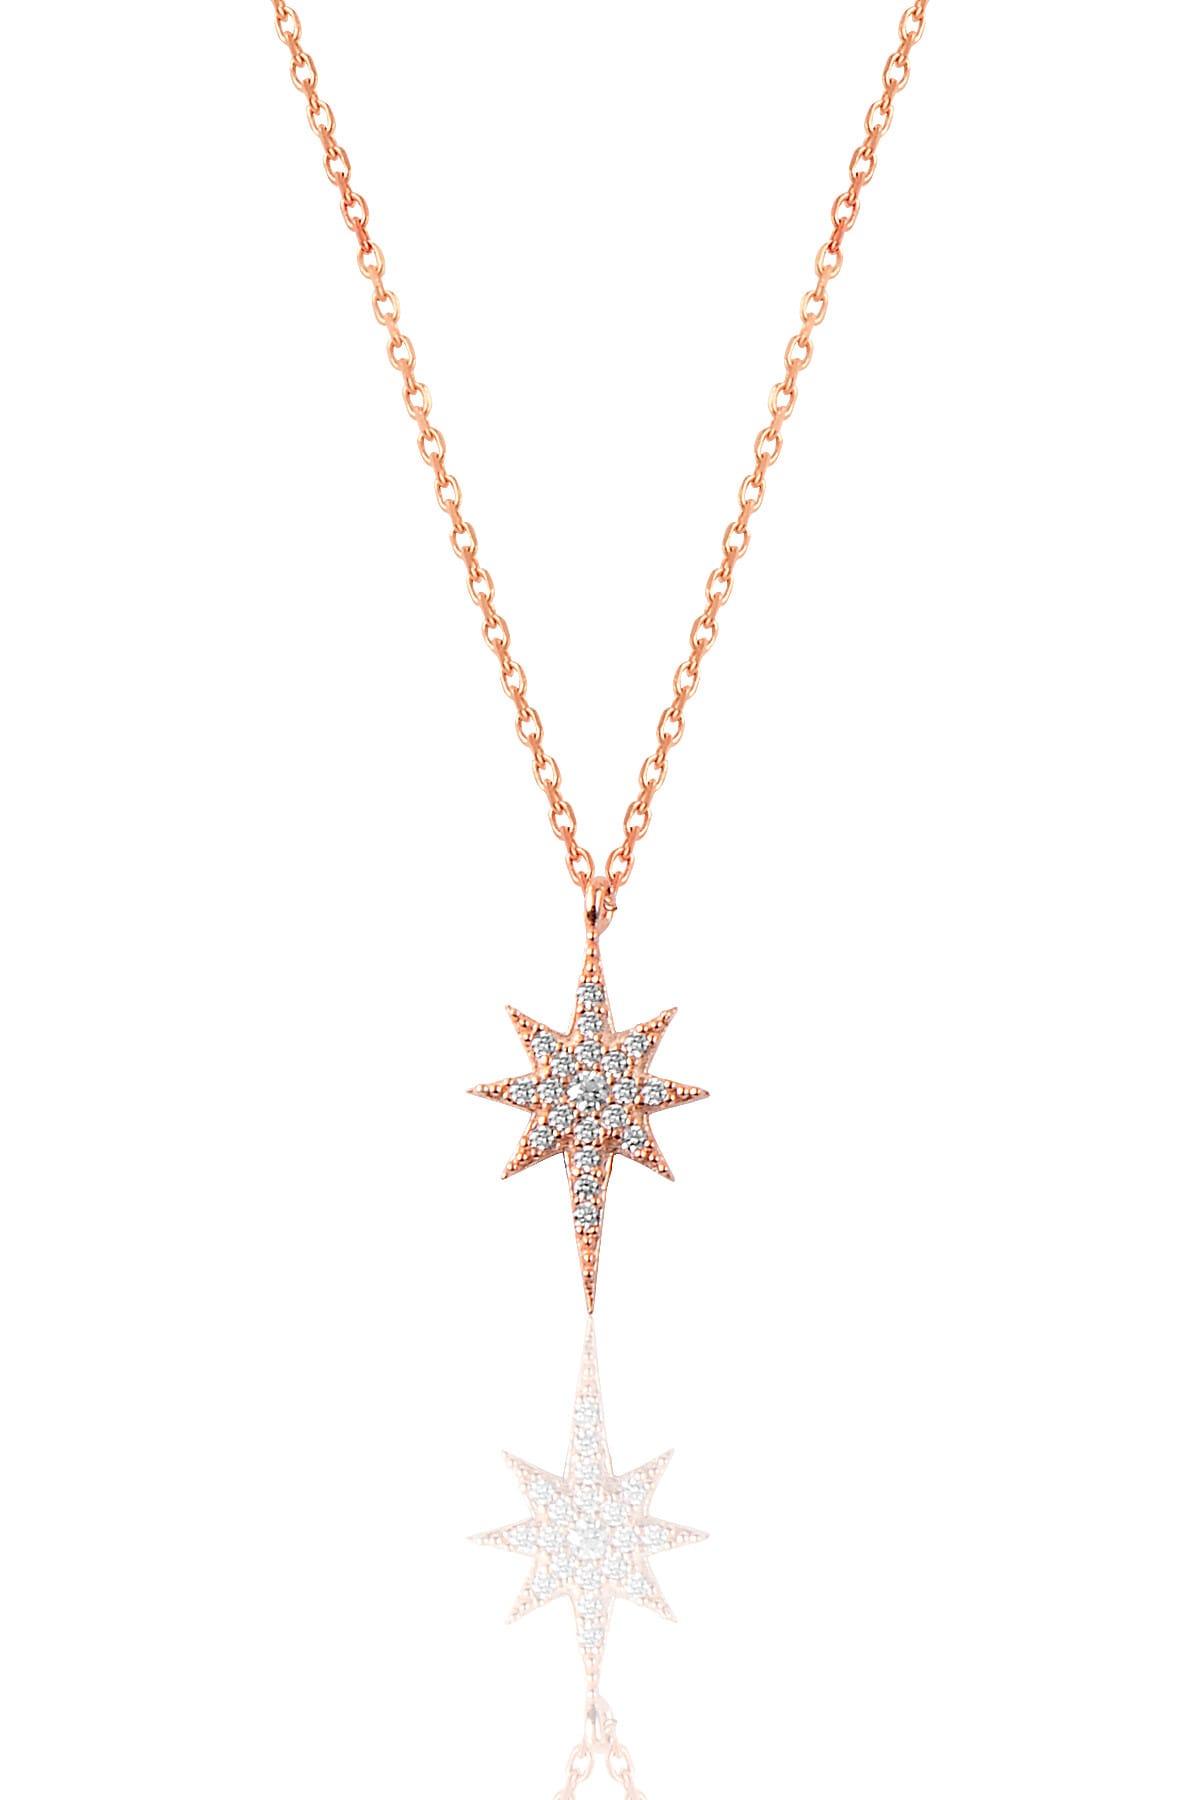 Söğütlü Silver Kadın Gümüş Zirkon Taşlı Kutup Yıldızı Kolye SGTL9568 1